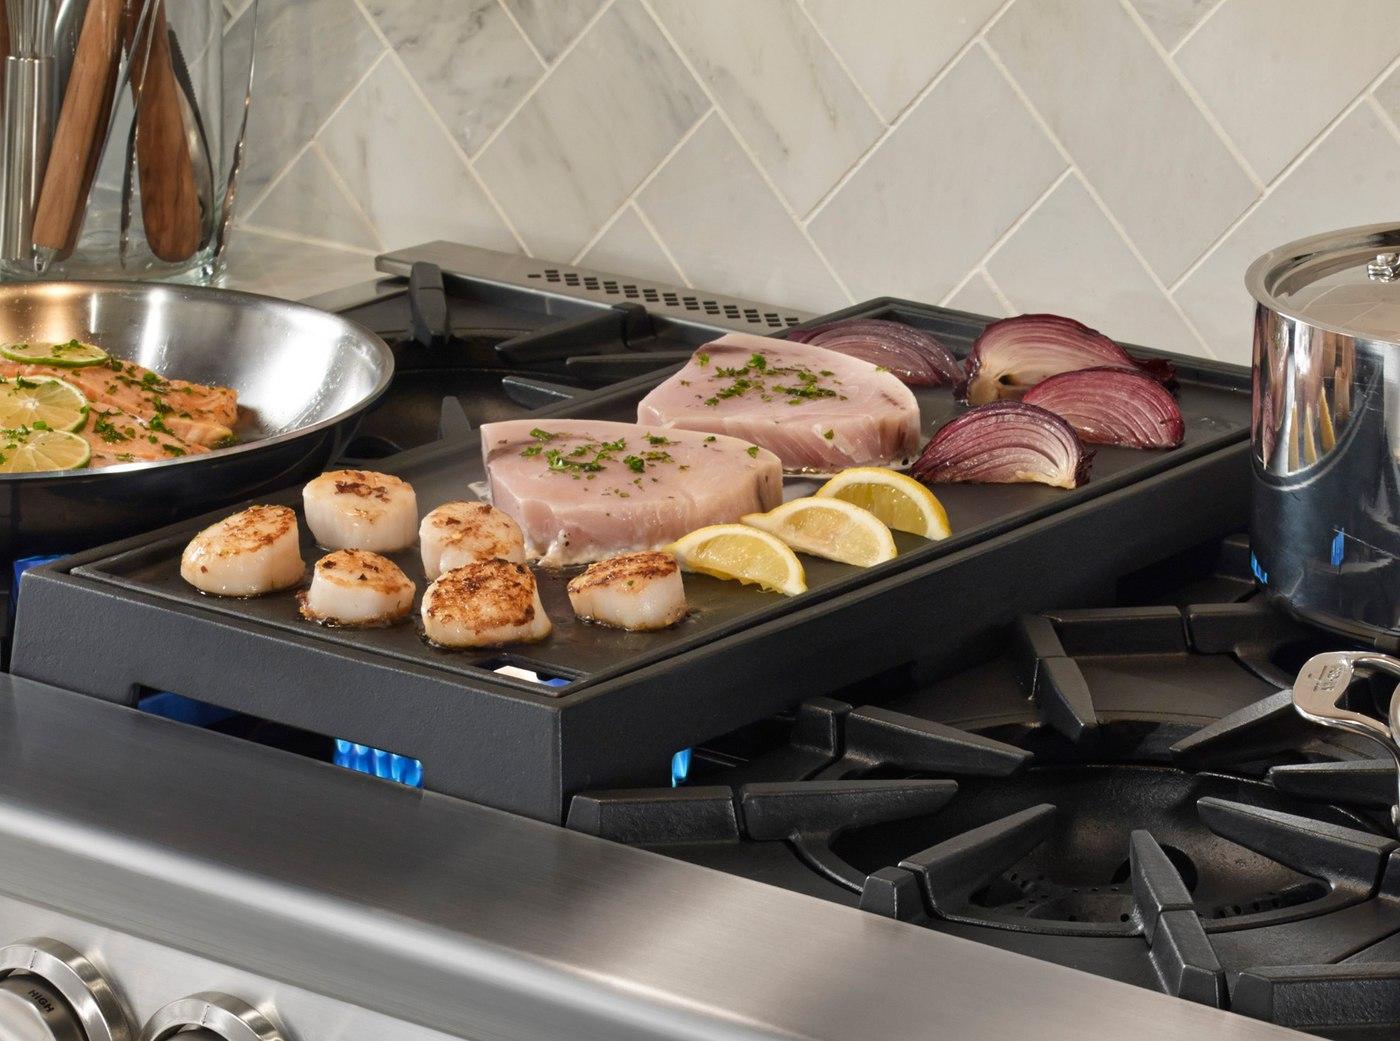 grill-griddle-accessory-bluestar-platinum